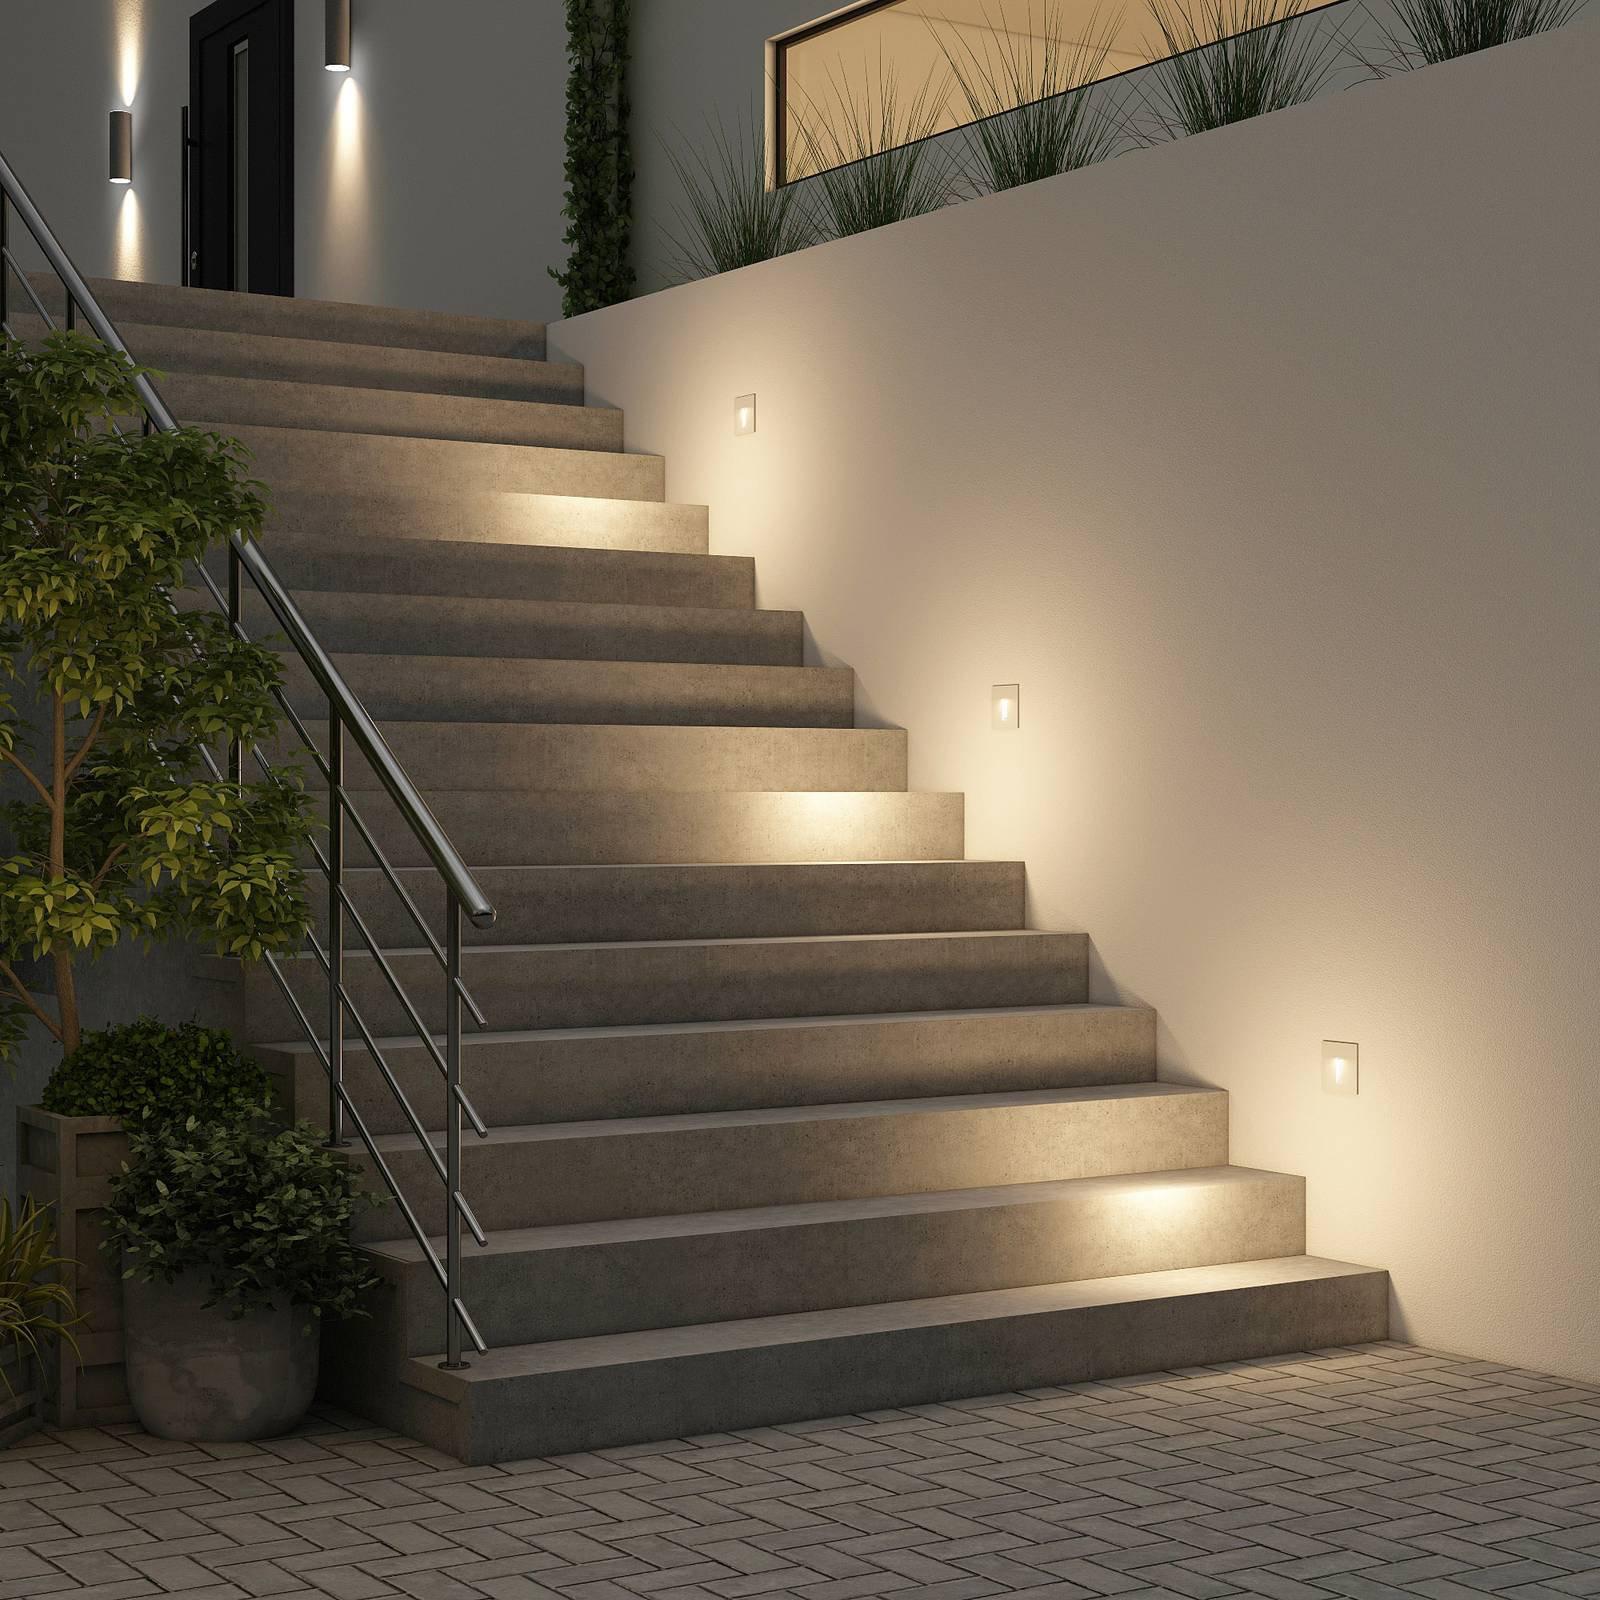 Arcchio Lanti LED-innfellingslampe, hvit